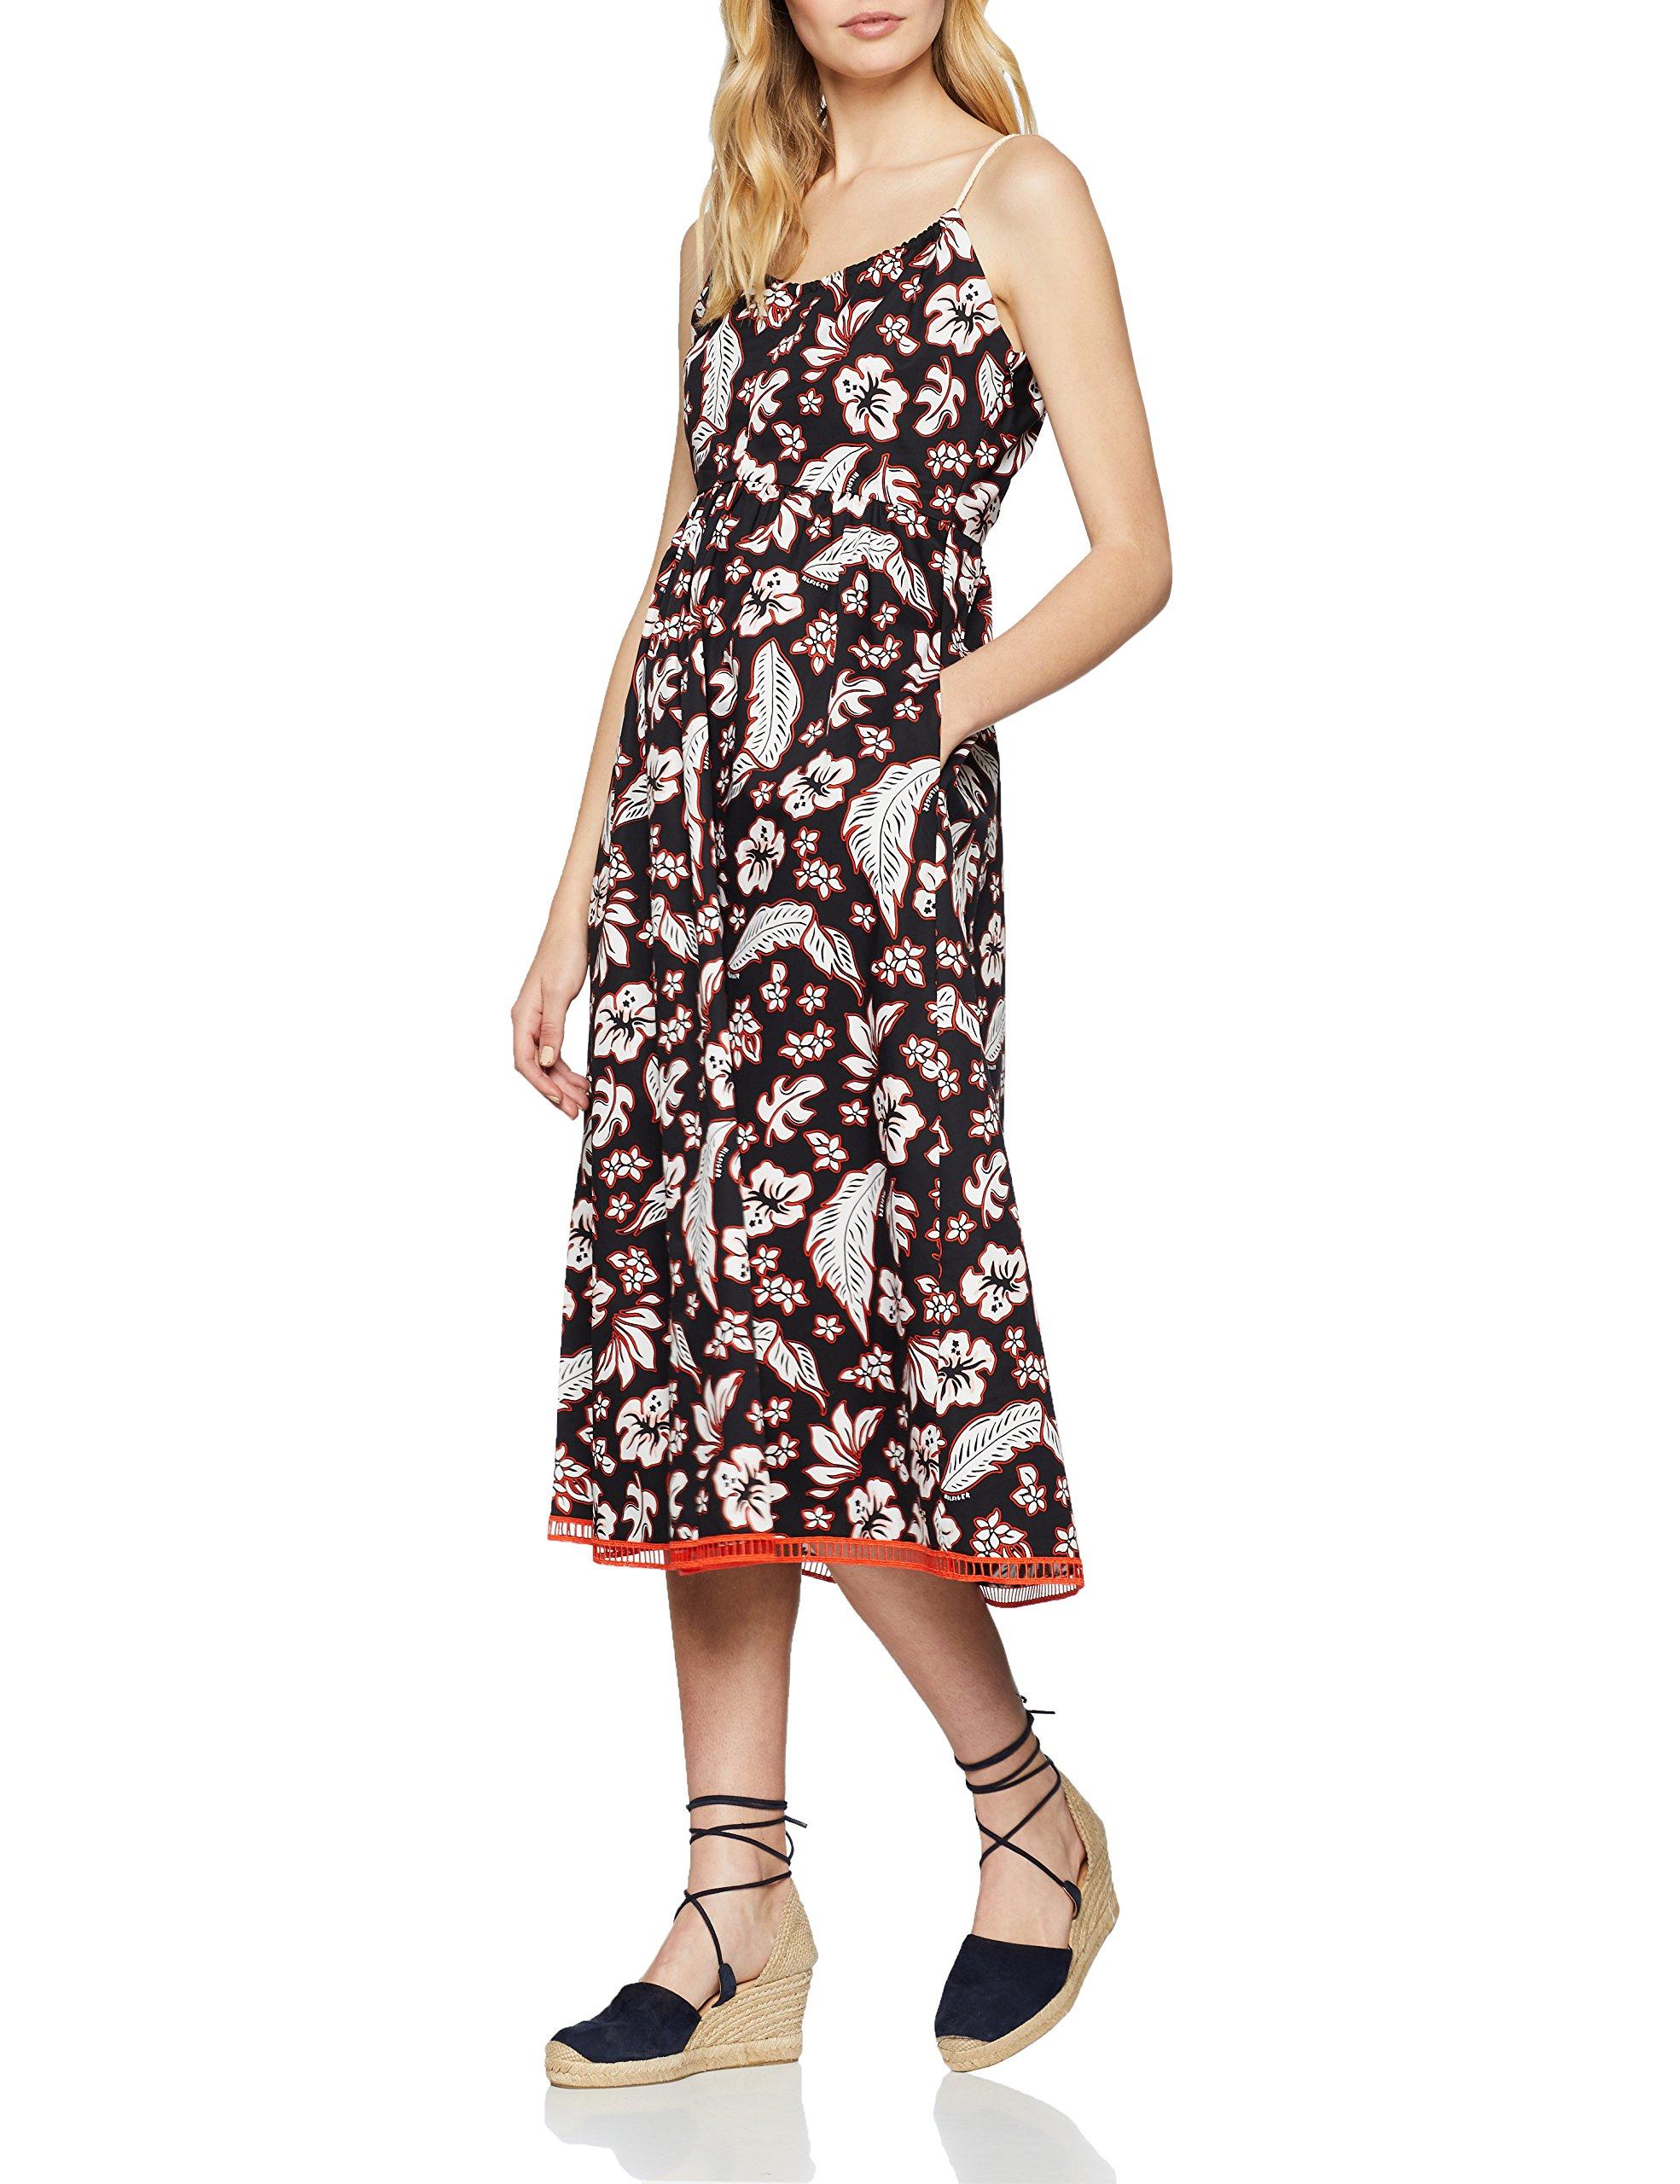 Tommy Hilfiger Petra Dress NS Vestido para Mujer